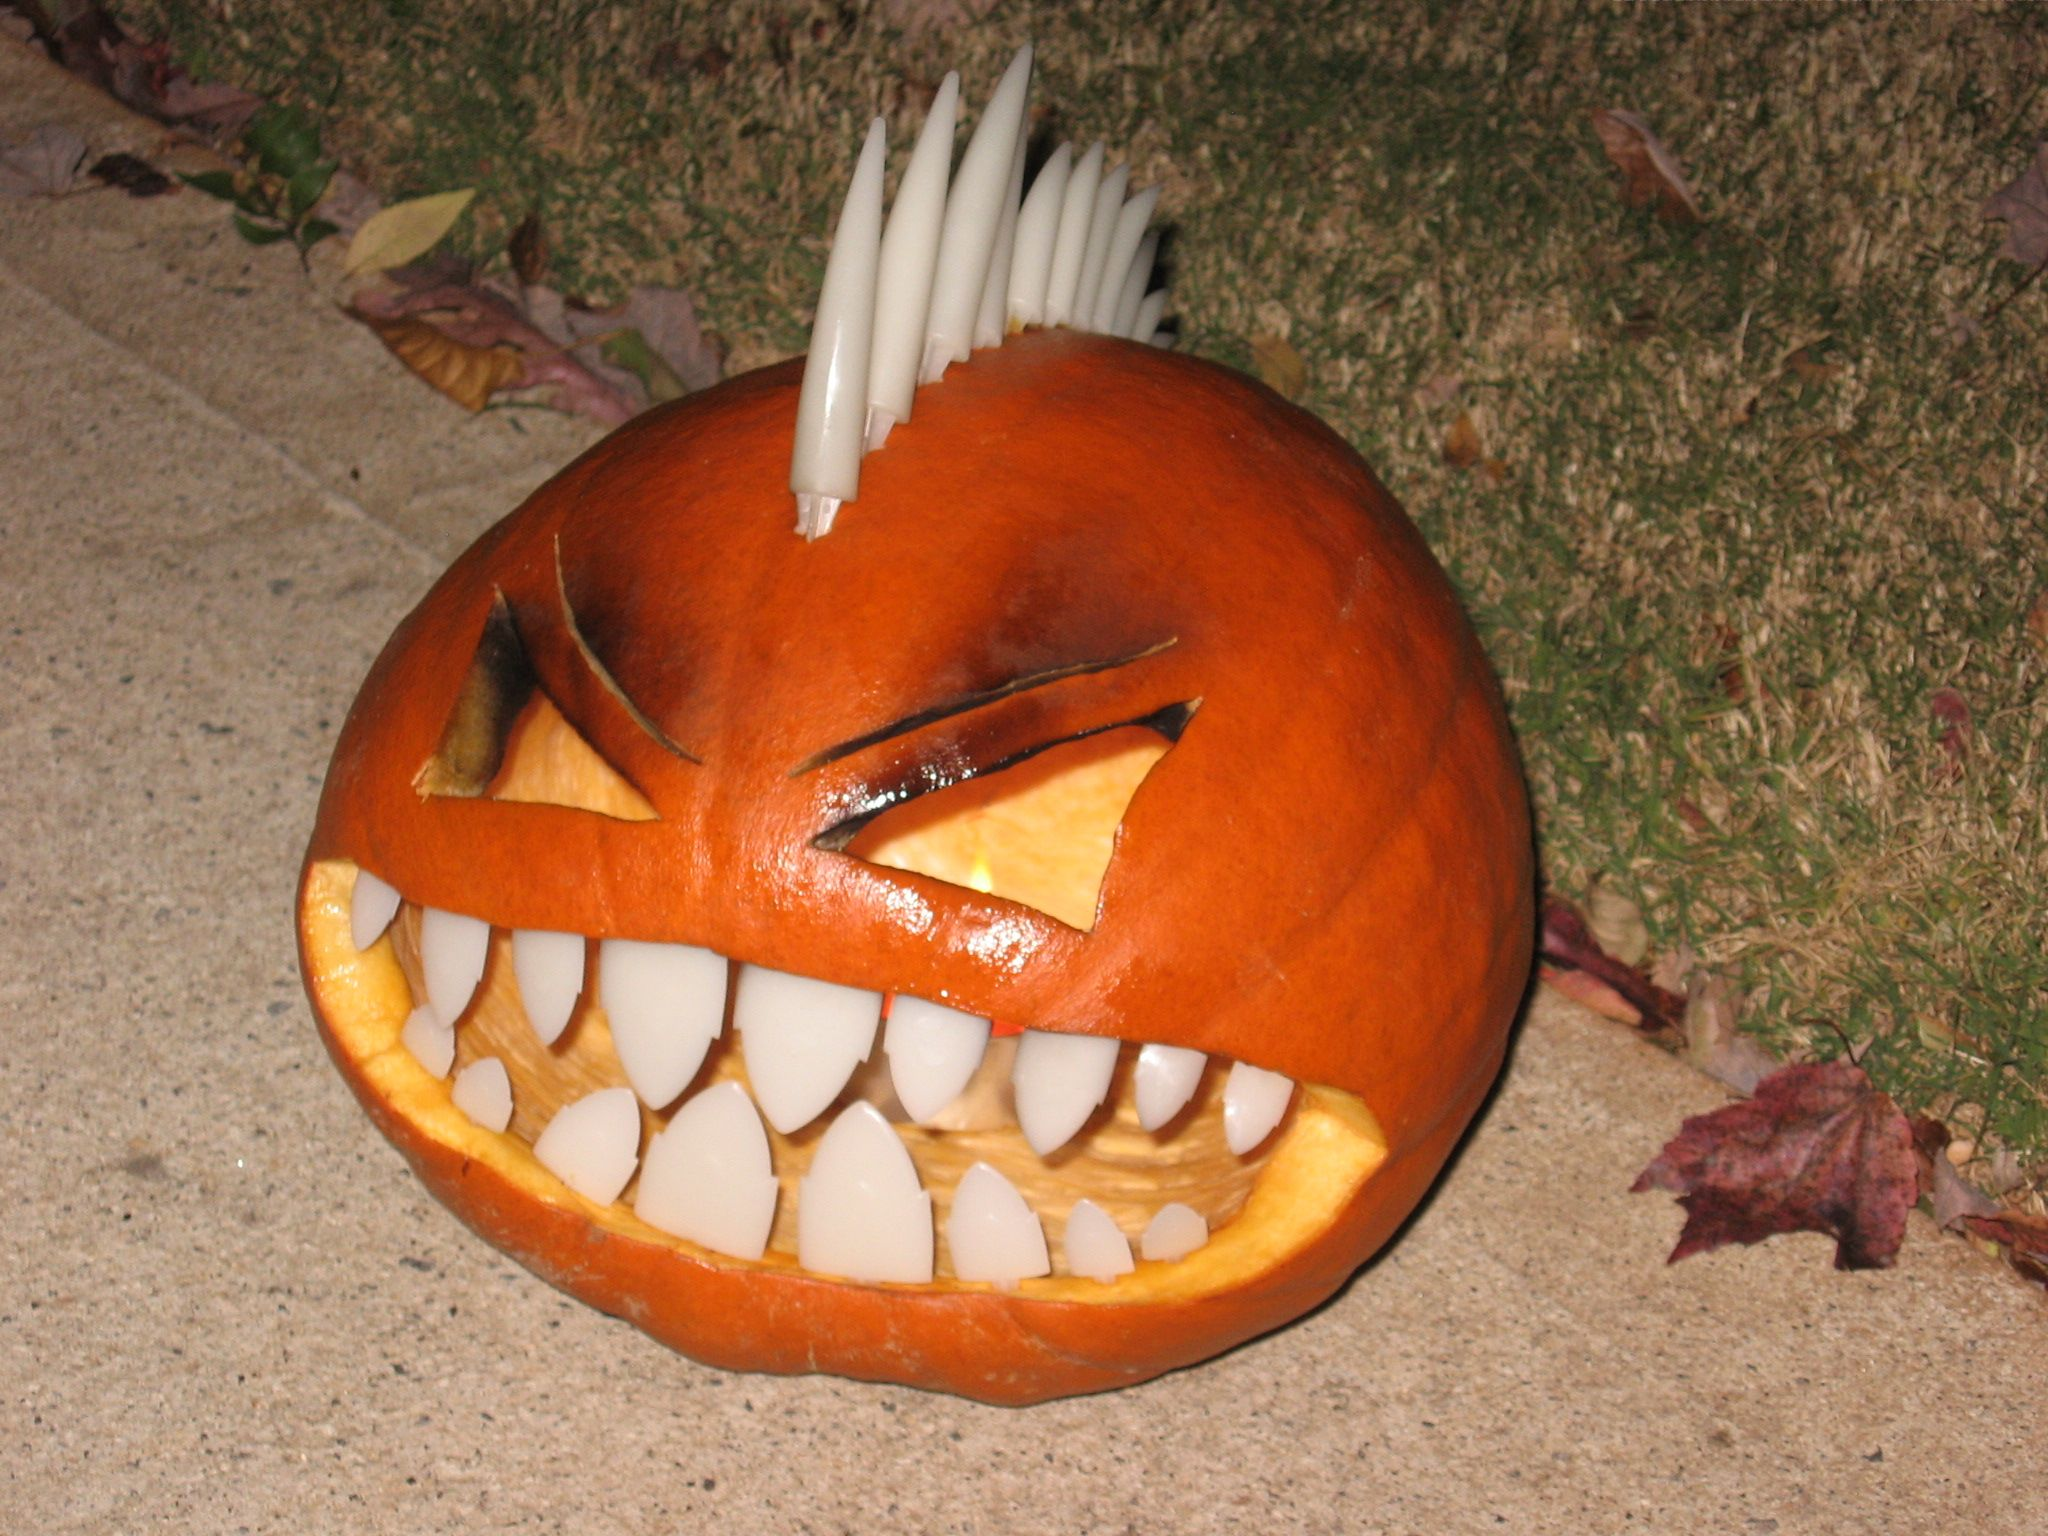 Halloween Pumpkin Carving Kit - Pumpkin Teeth for your Jack O Lantern - Set of 18 Blood Tipped Fang Teeth